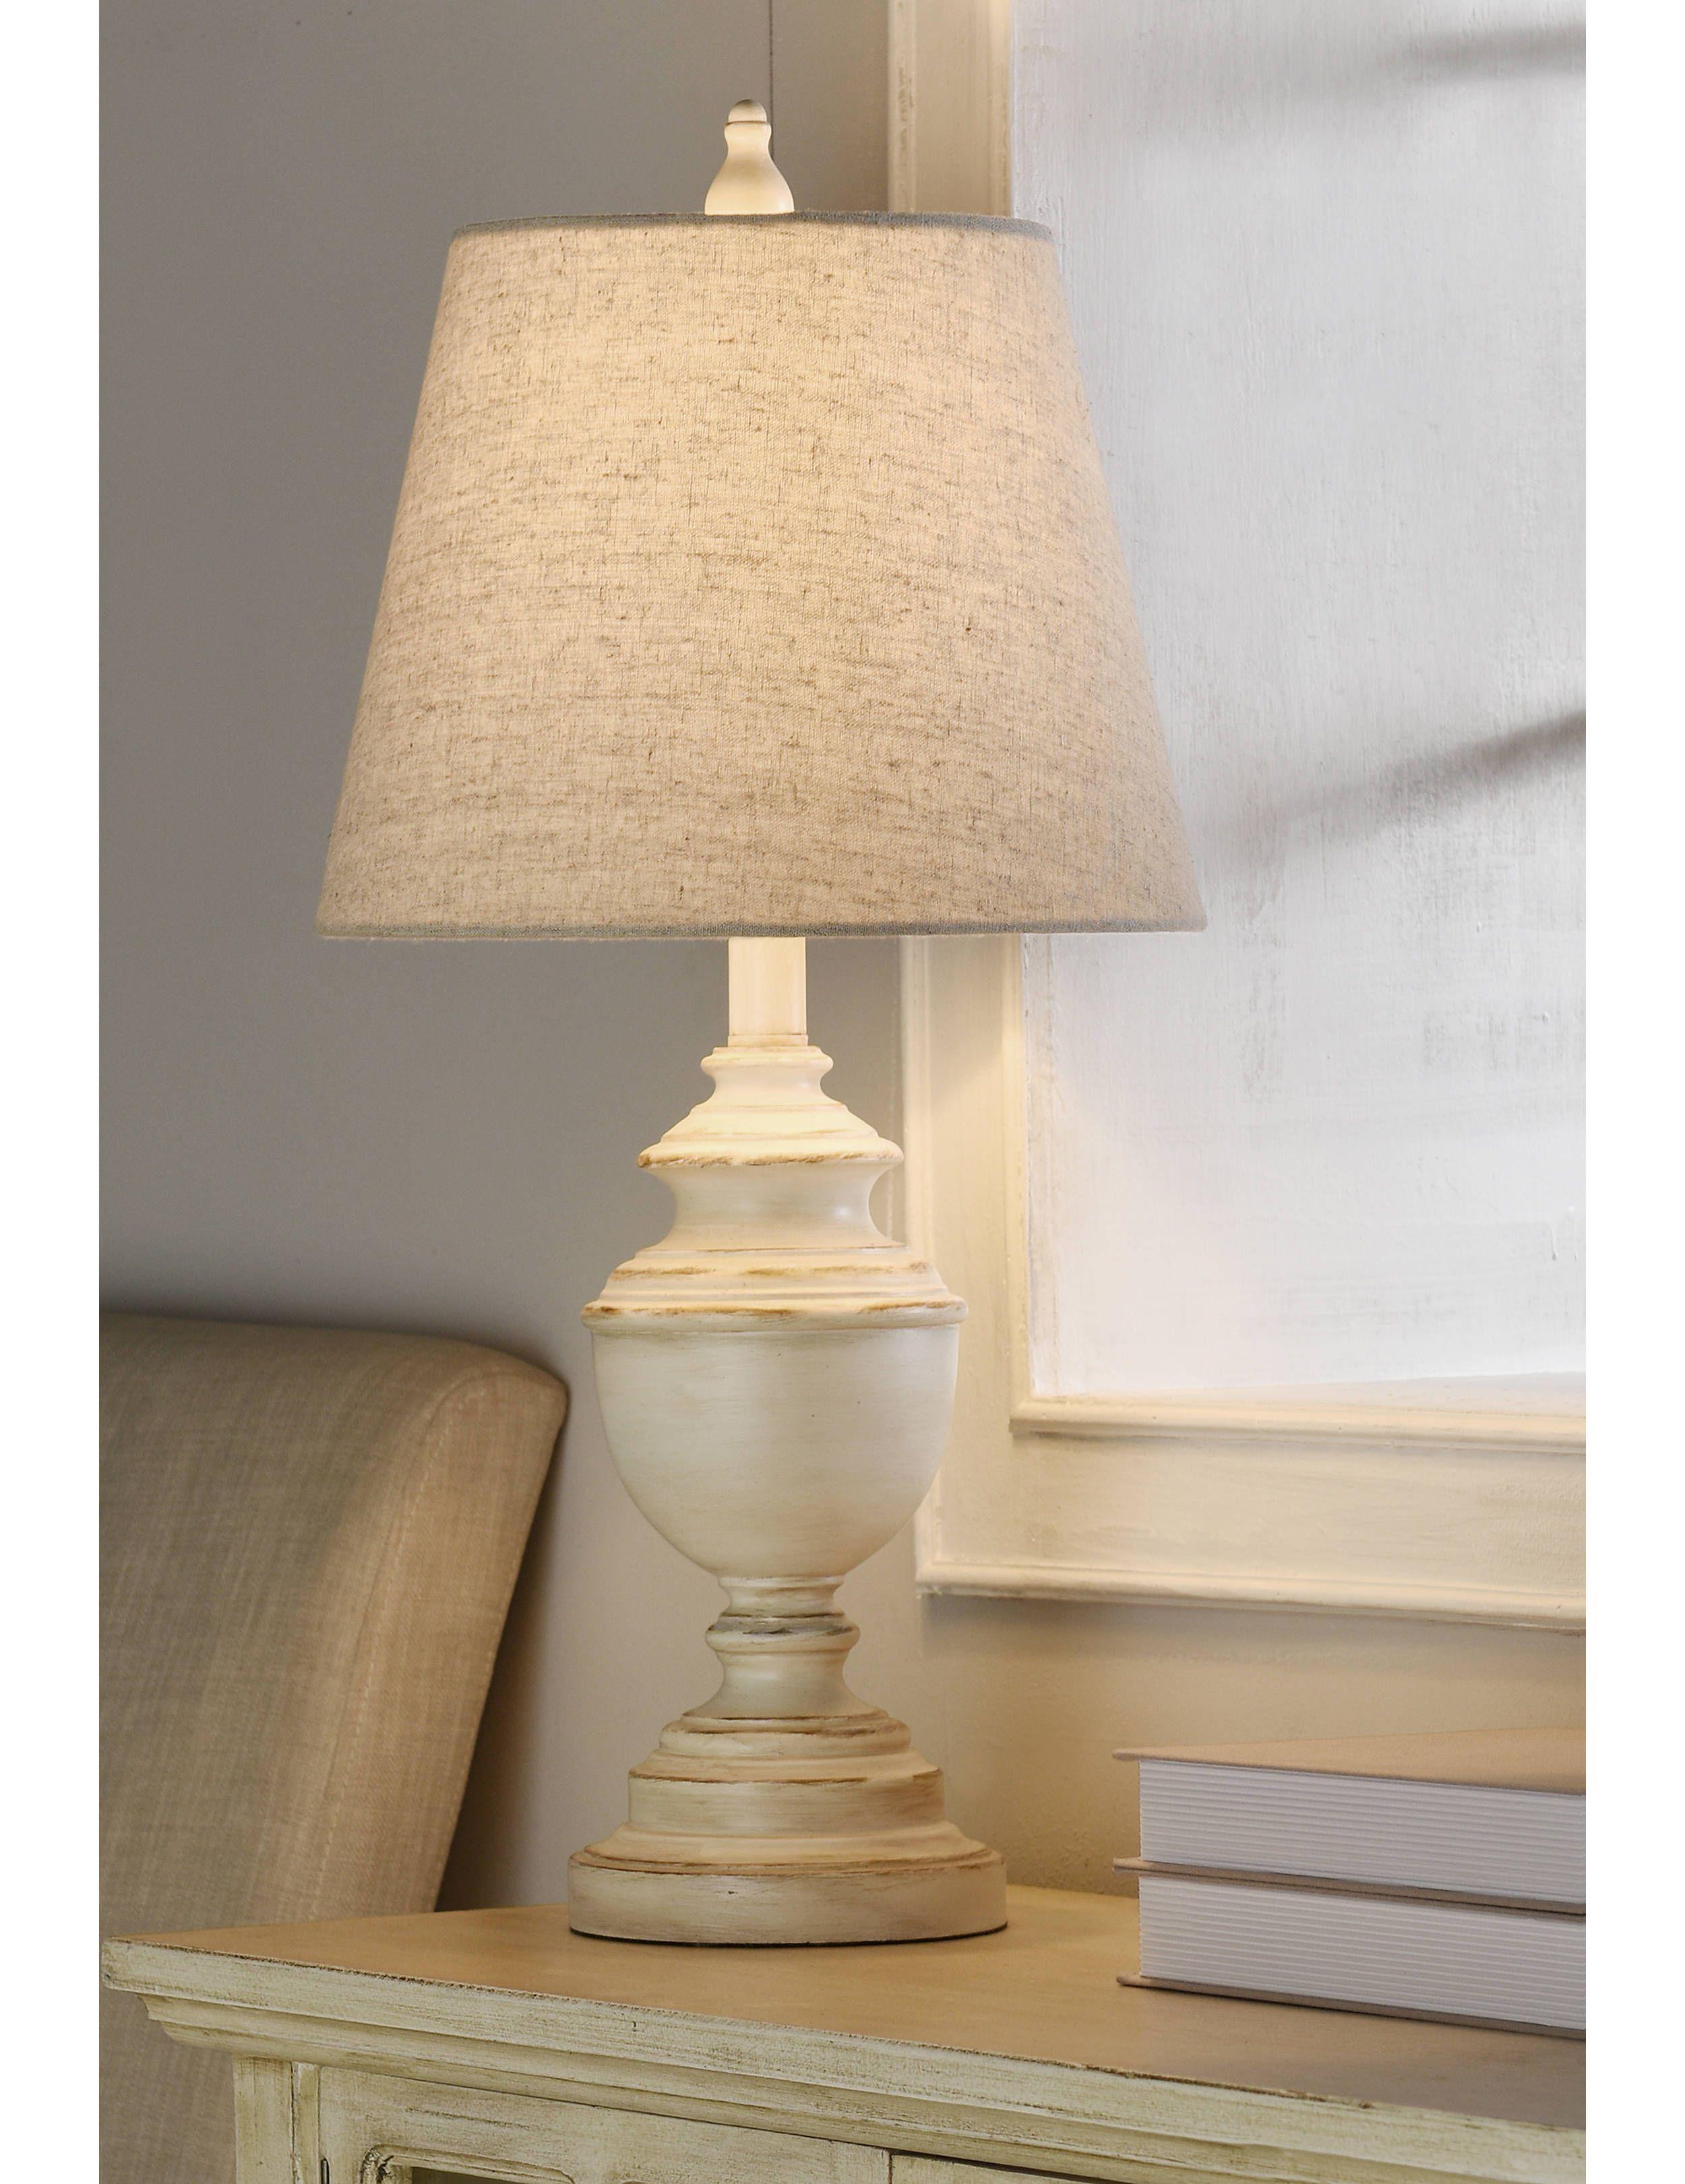 Distressed Cream Table Lamp Table Lamp Cream Lamps Cream Table